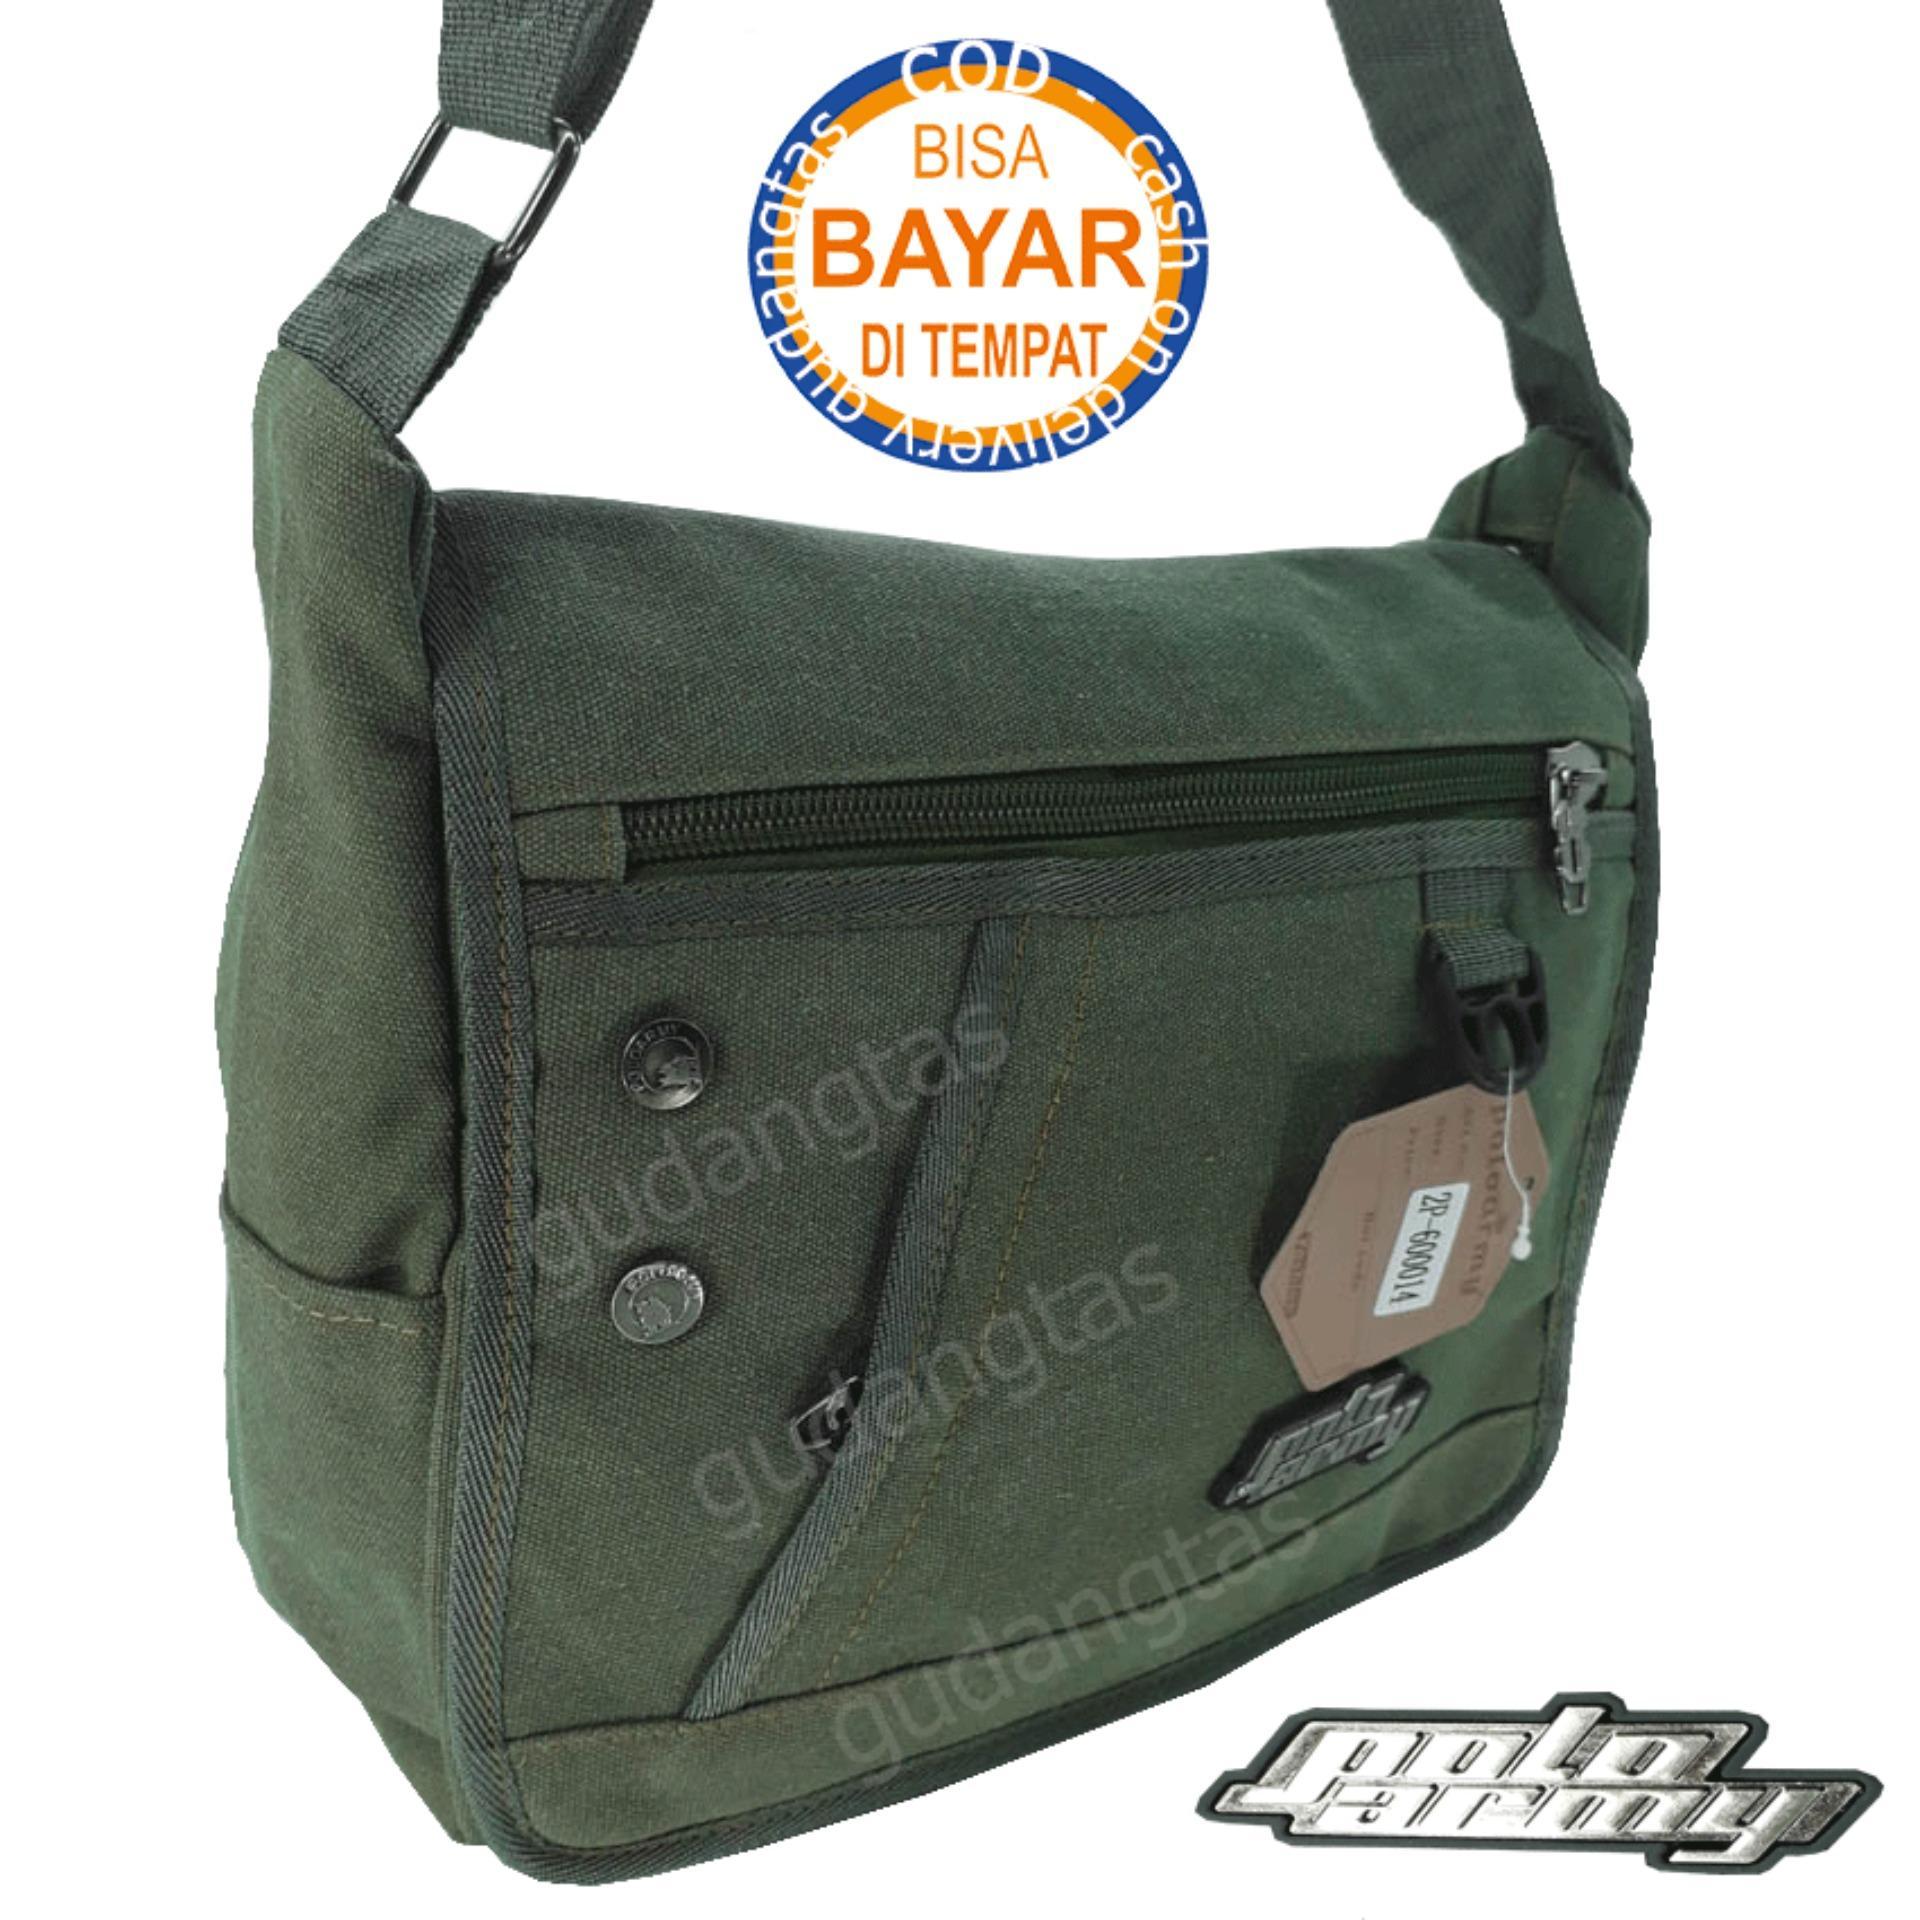 Polo Army Tas Selempang Canvas Shoulder Bag Kanvas Original Hijau